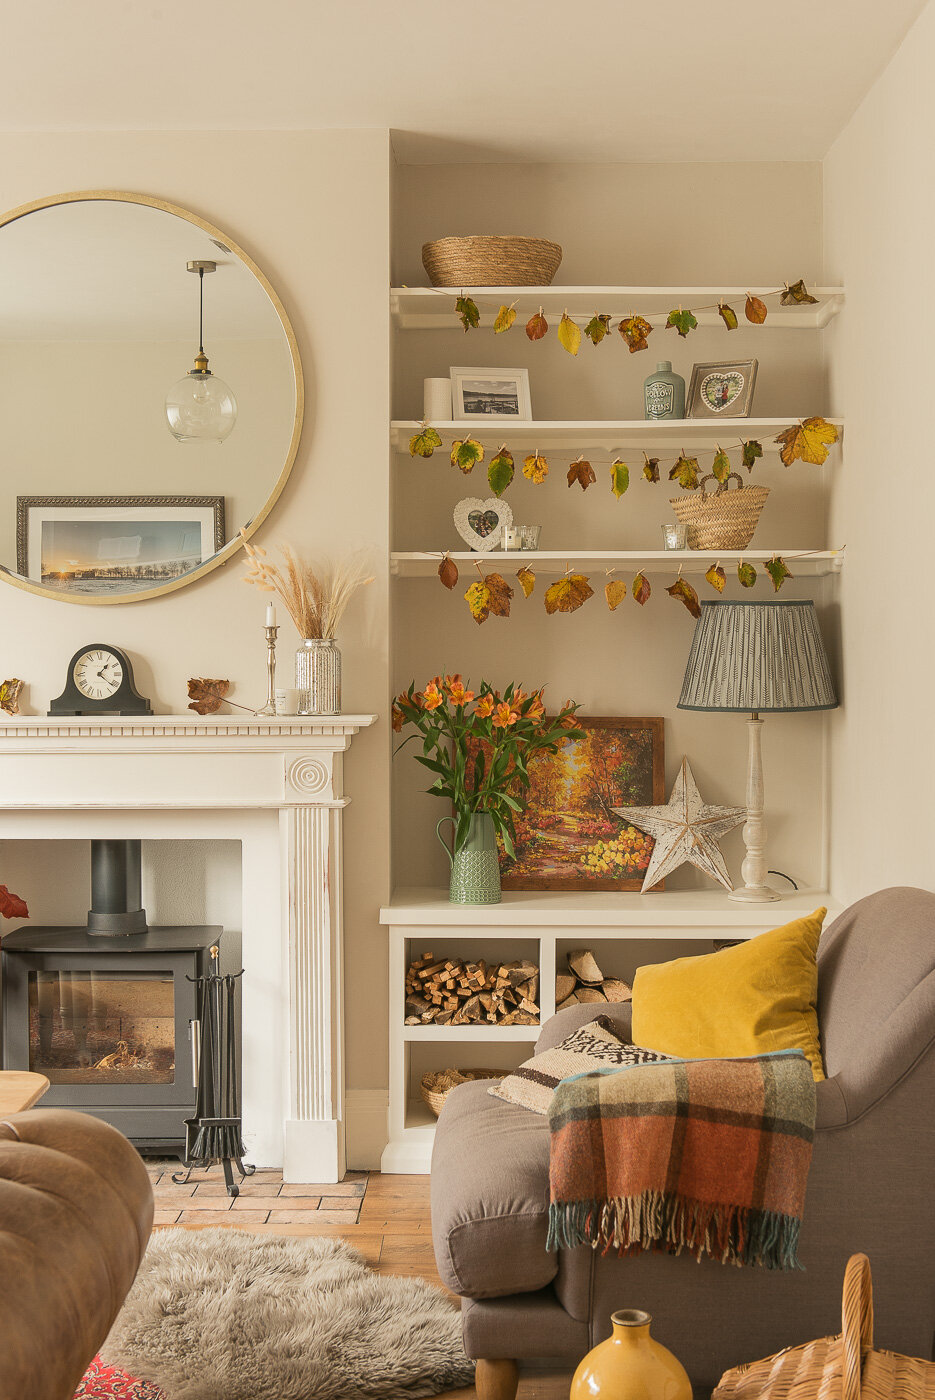 Our Living Room Autumn Makeover Autumn Home Decor Ideas Fifi Mcgee Interiors Renovation Blog